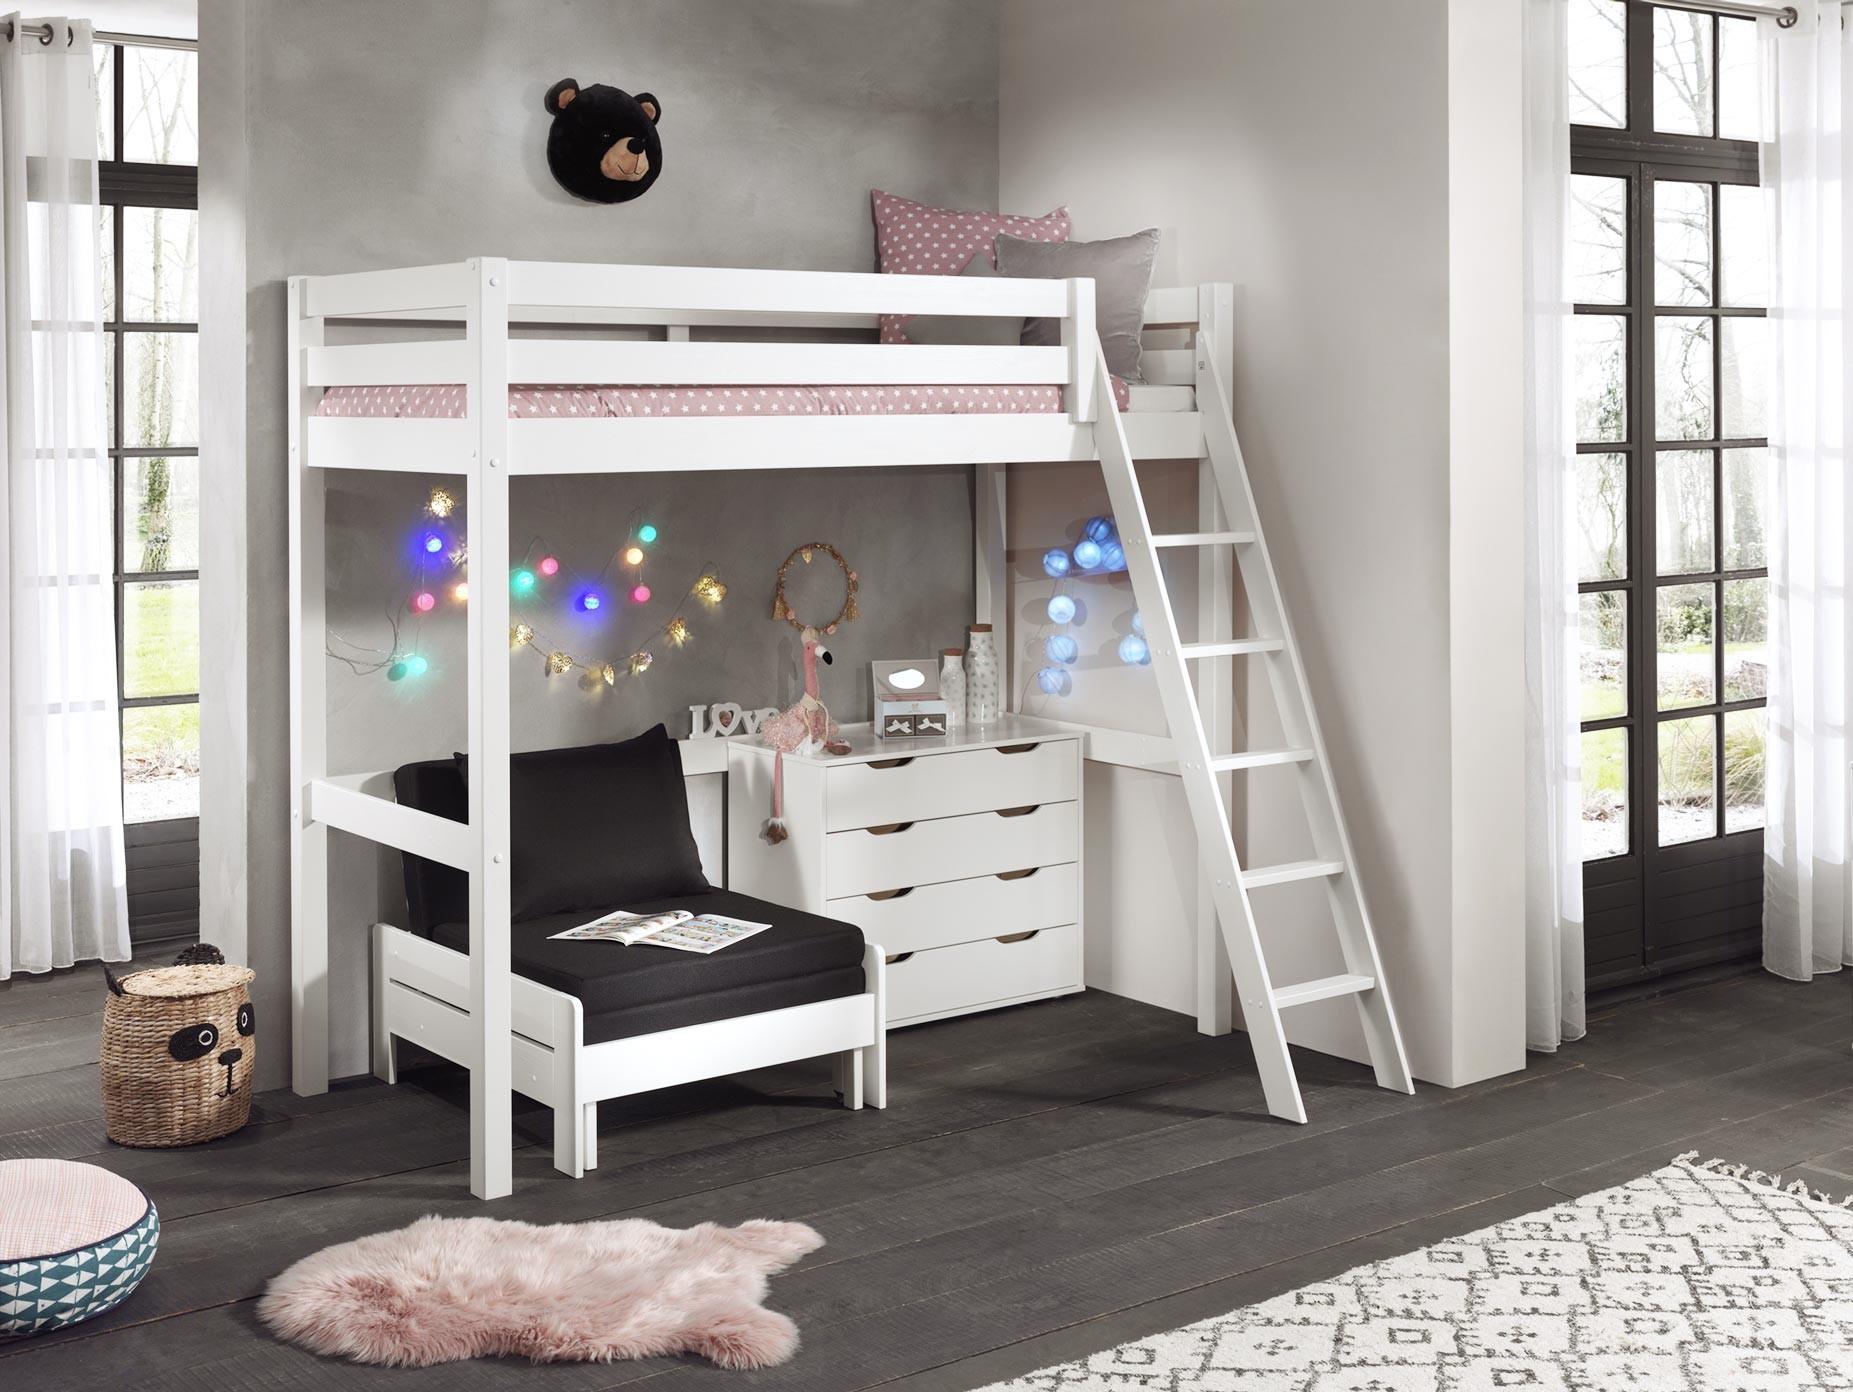 lit mezzanine pour enfant clara en pin